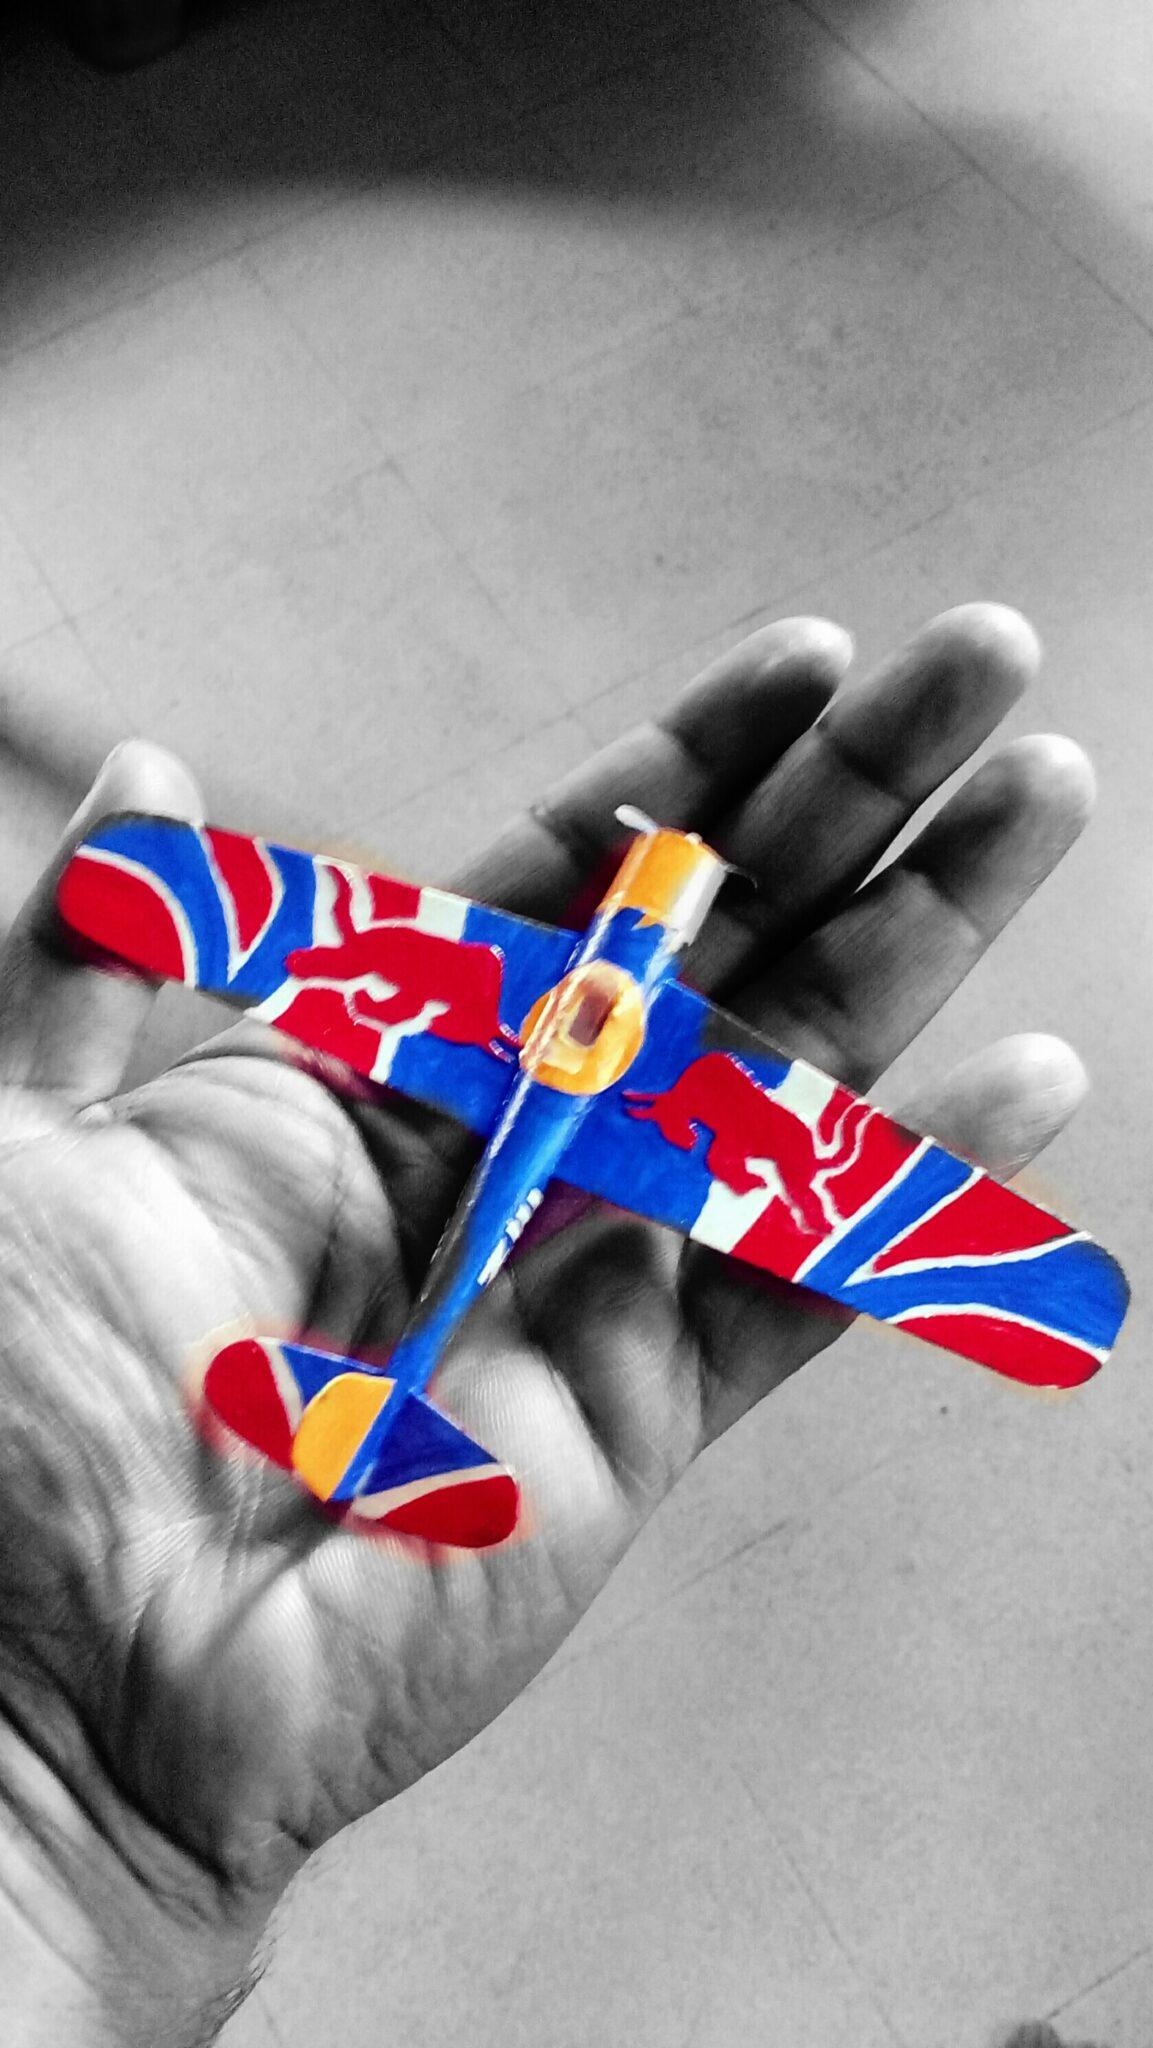 Miniature Red Bull Plane